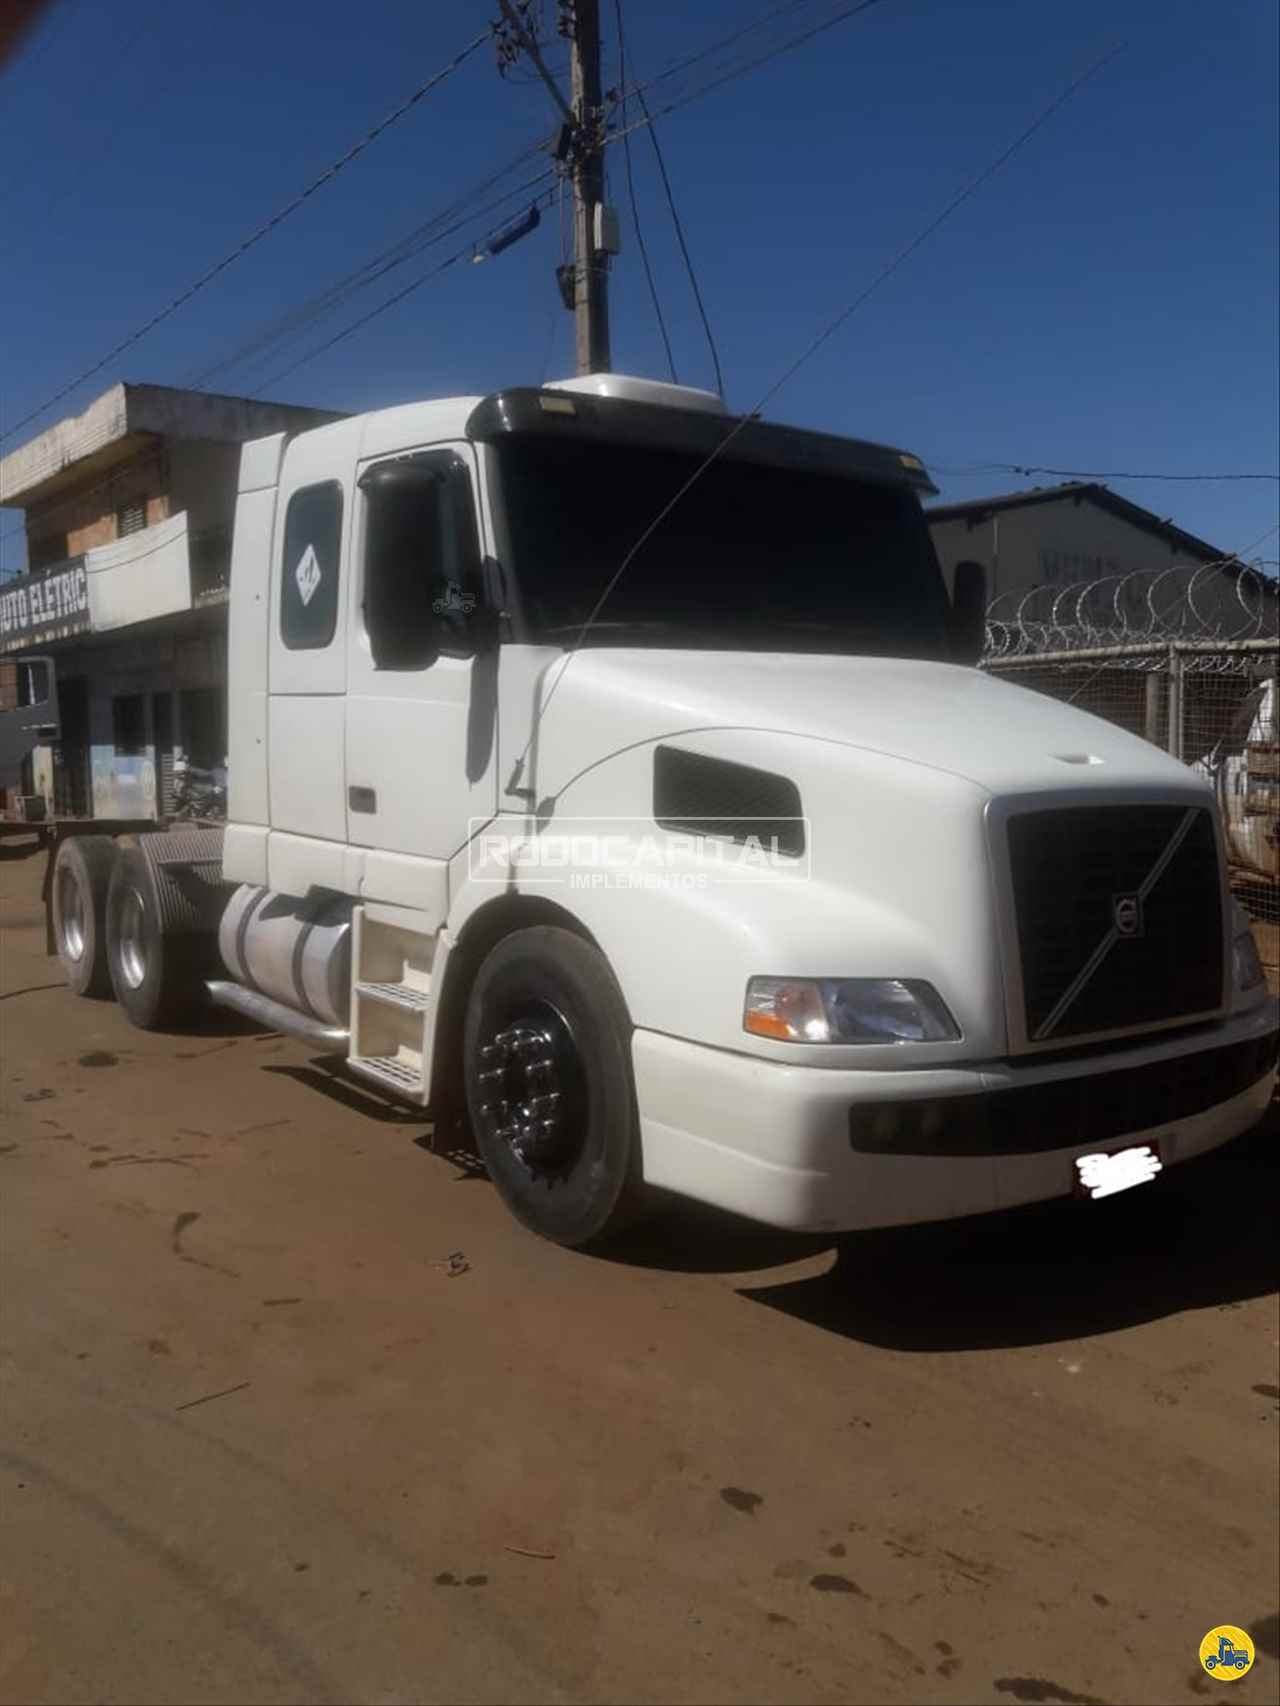 CAMINHAO VOLVO VOLVO NH12 380 Cavalo Mecânico Truck 6x2 RODOCAPITAL - TRUCKVAN BRASILIA DISTRITO FEDERAL DF